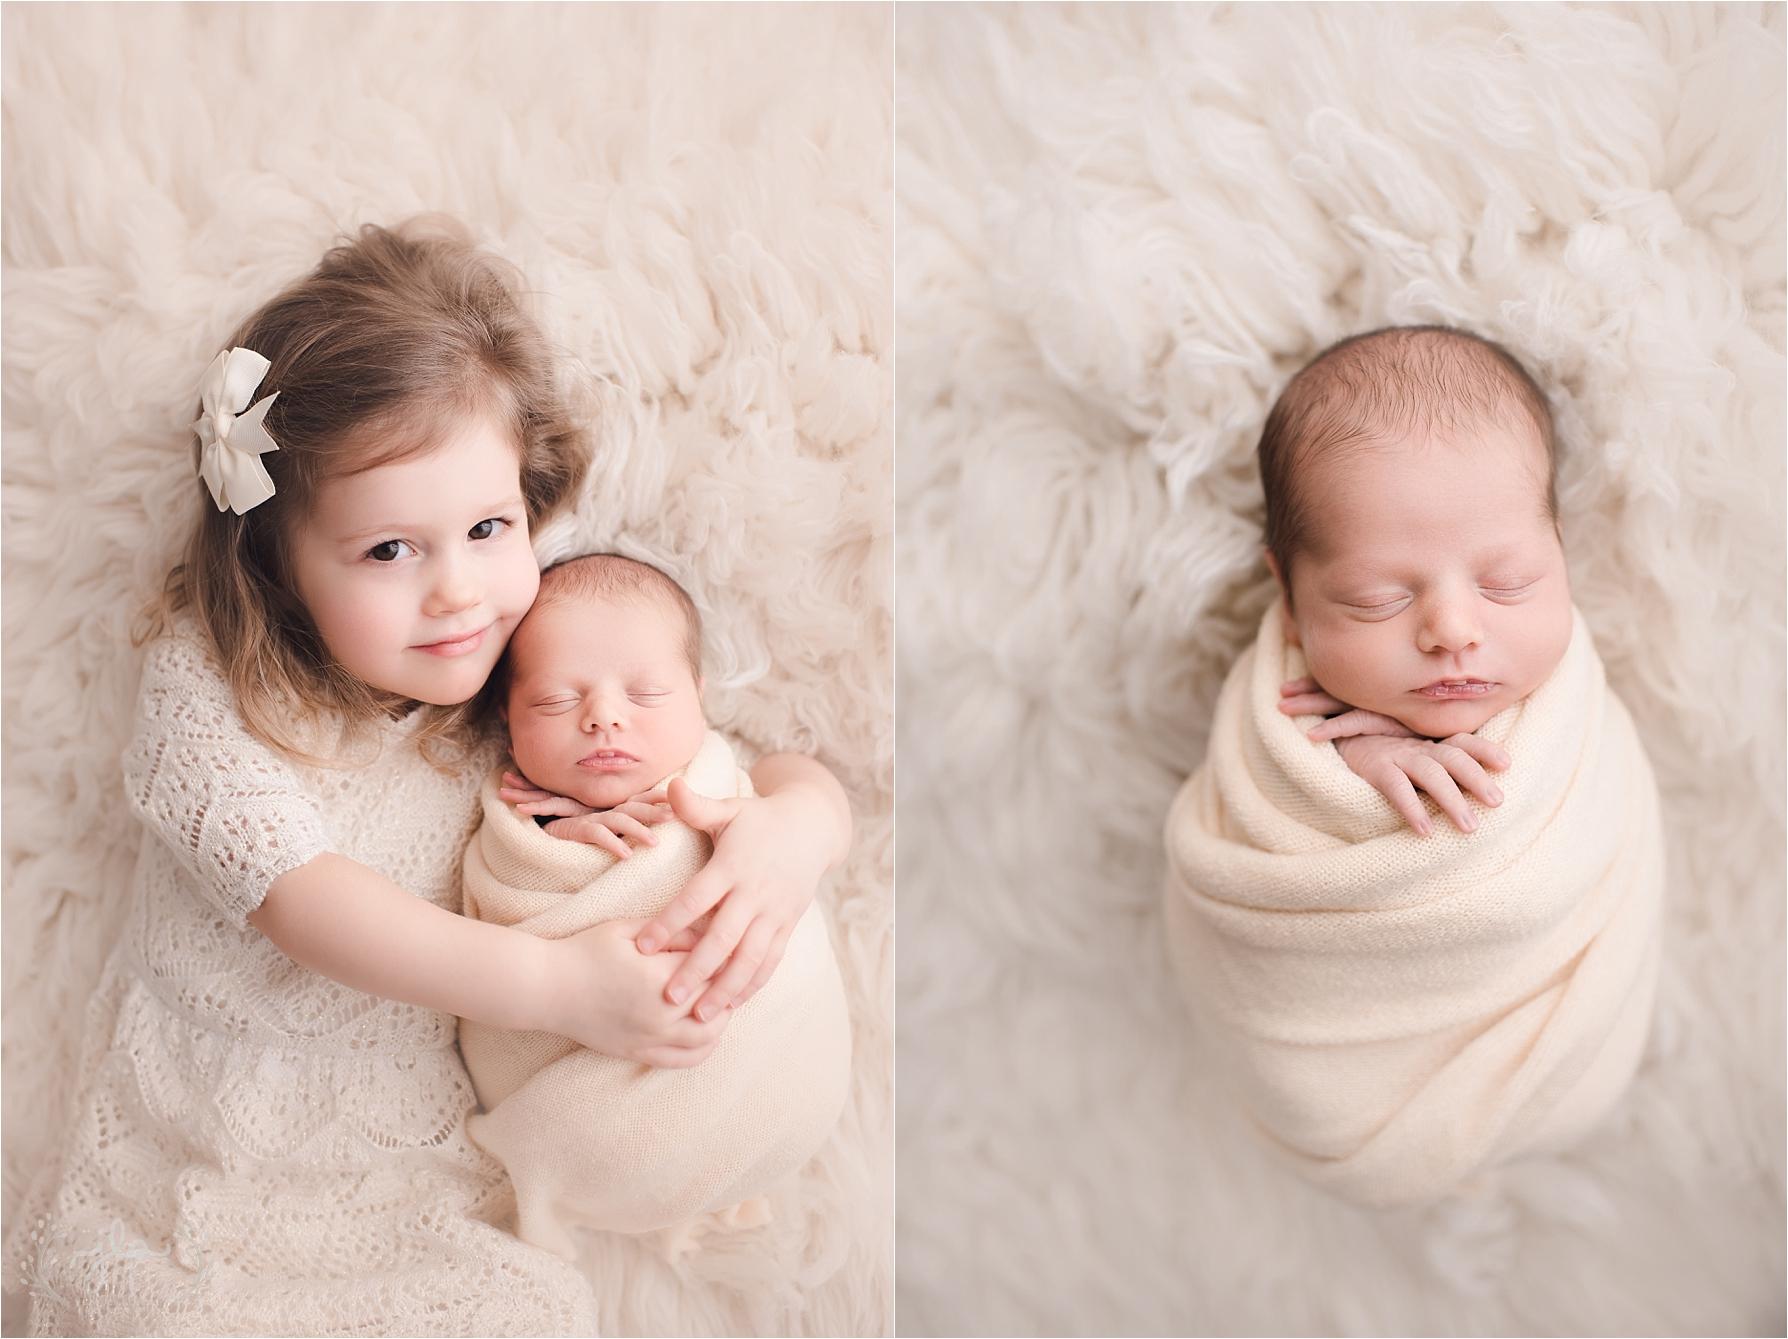 Cooper 6 days maryland newborn photographer